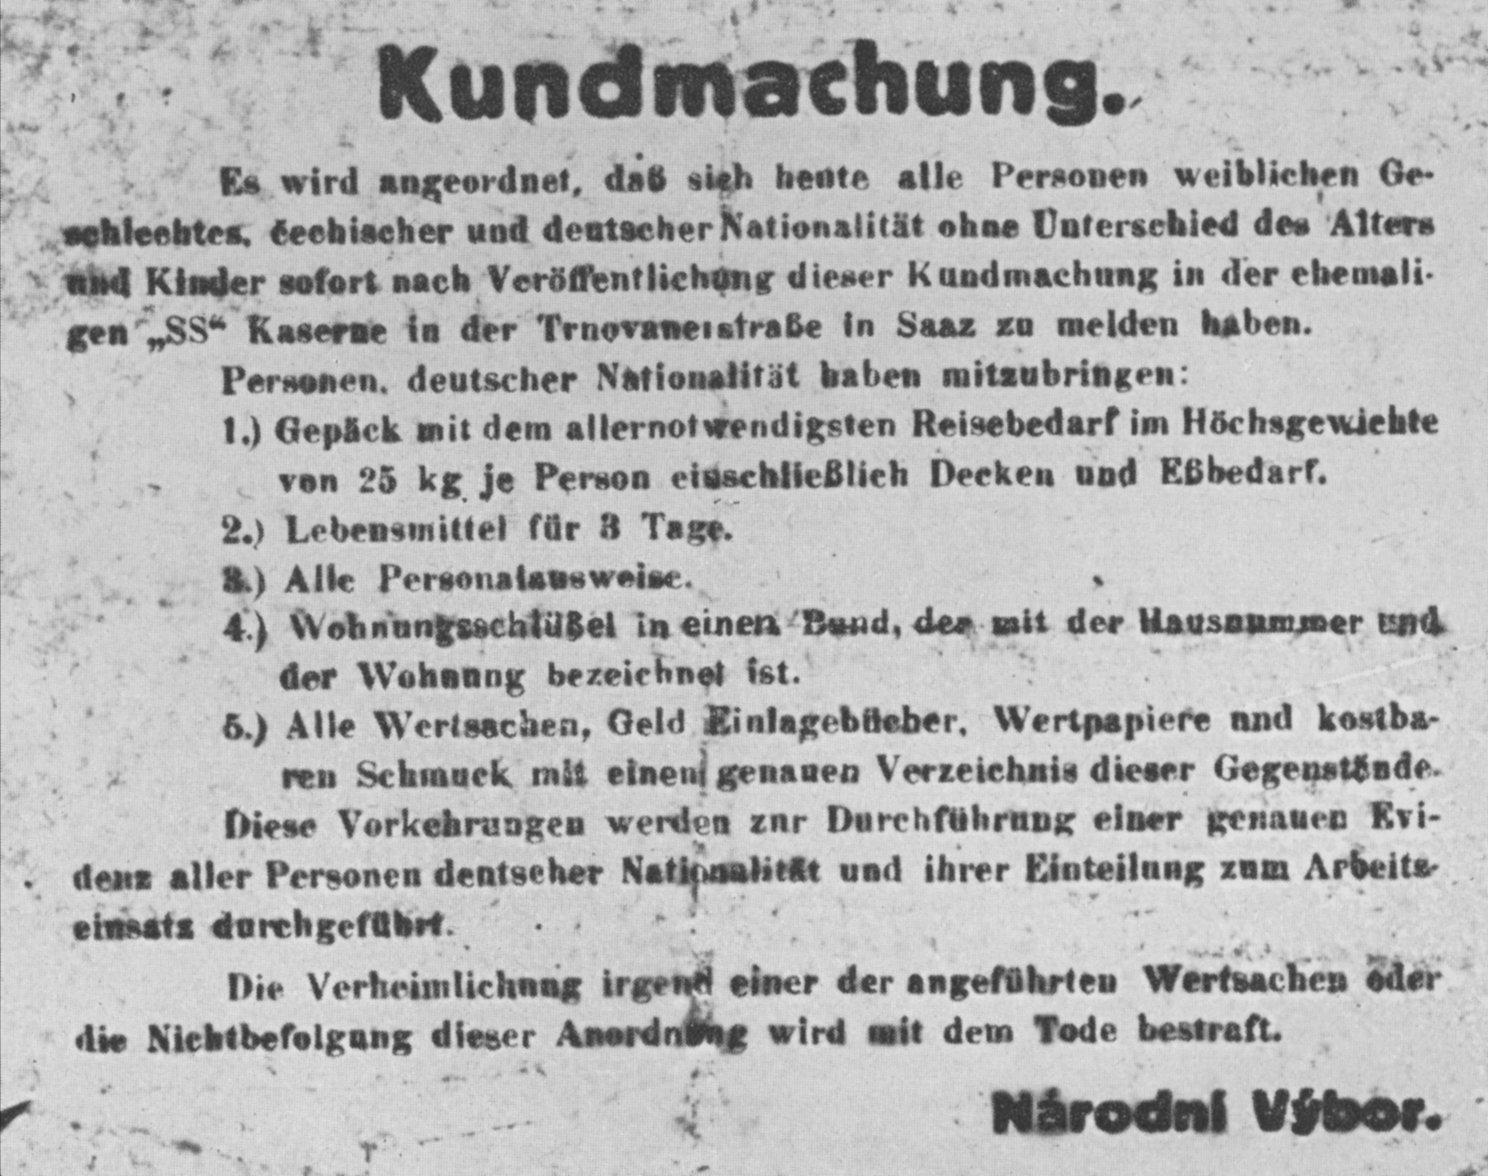 https://i0.wp.com/de.metapedia.org/m/images/6/62/Dokumente_zur_Austreibung_der_Sudetendeutschen_-_Kundmachung.jpg